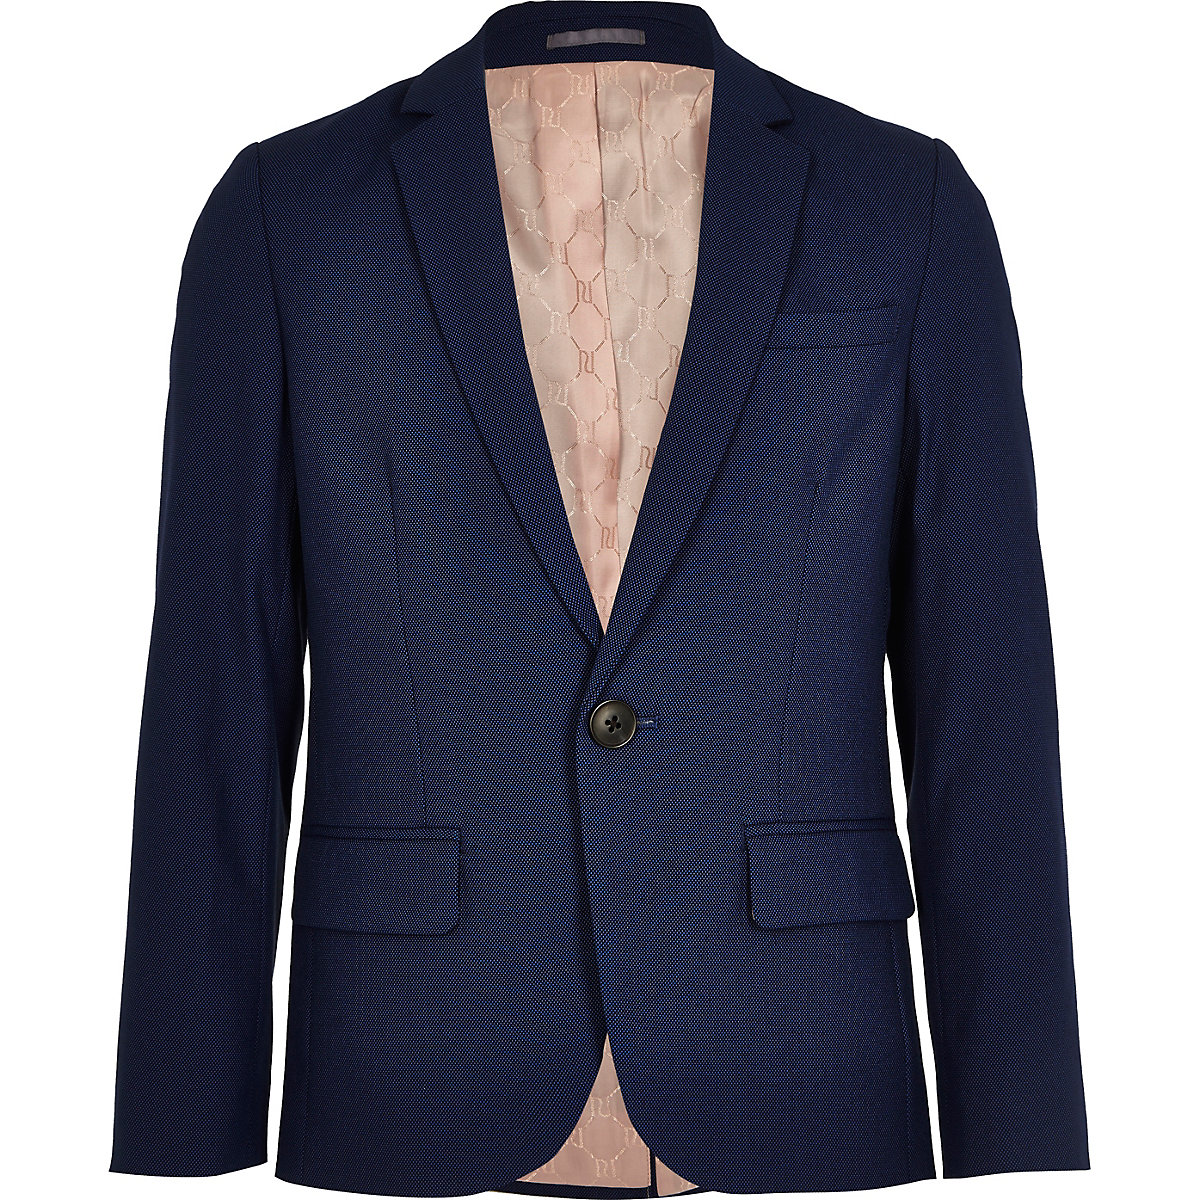 Boys blue suit blazer jacket